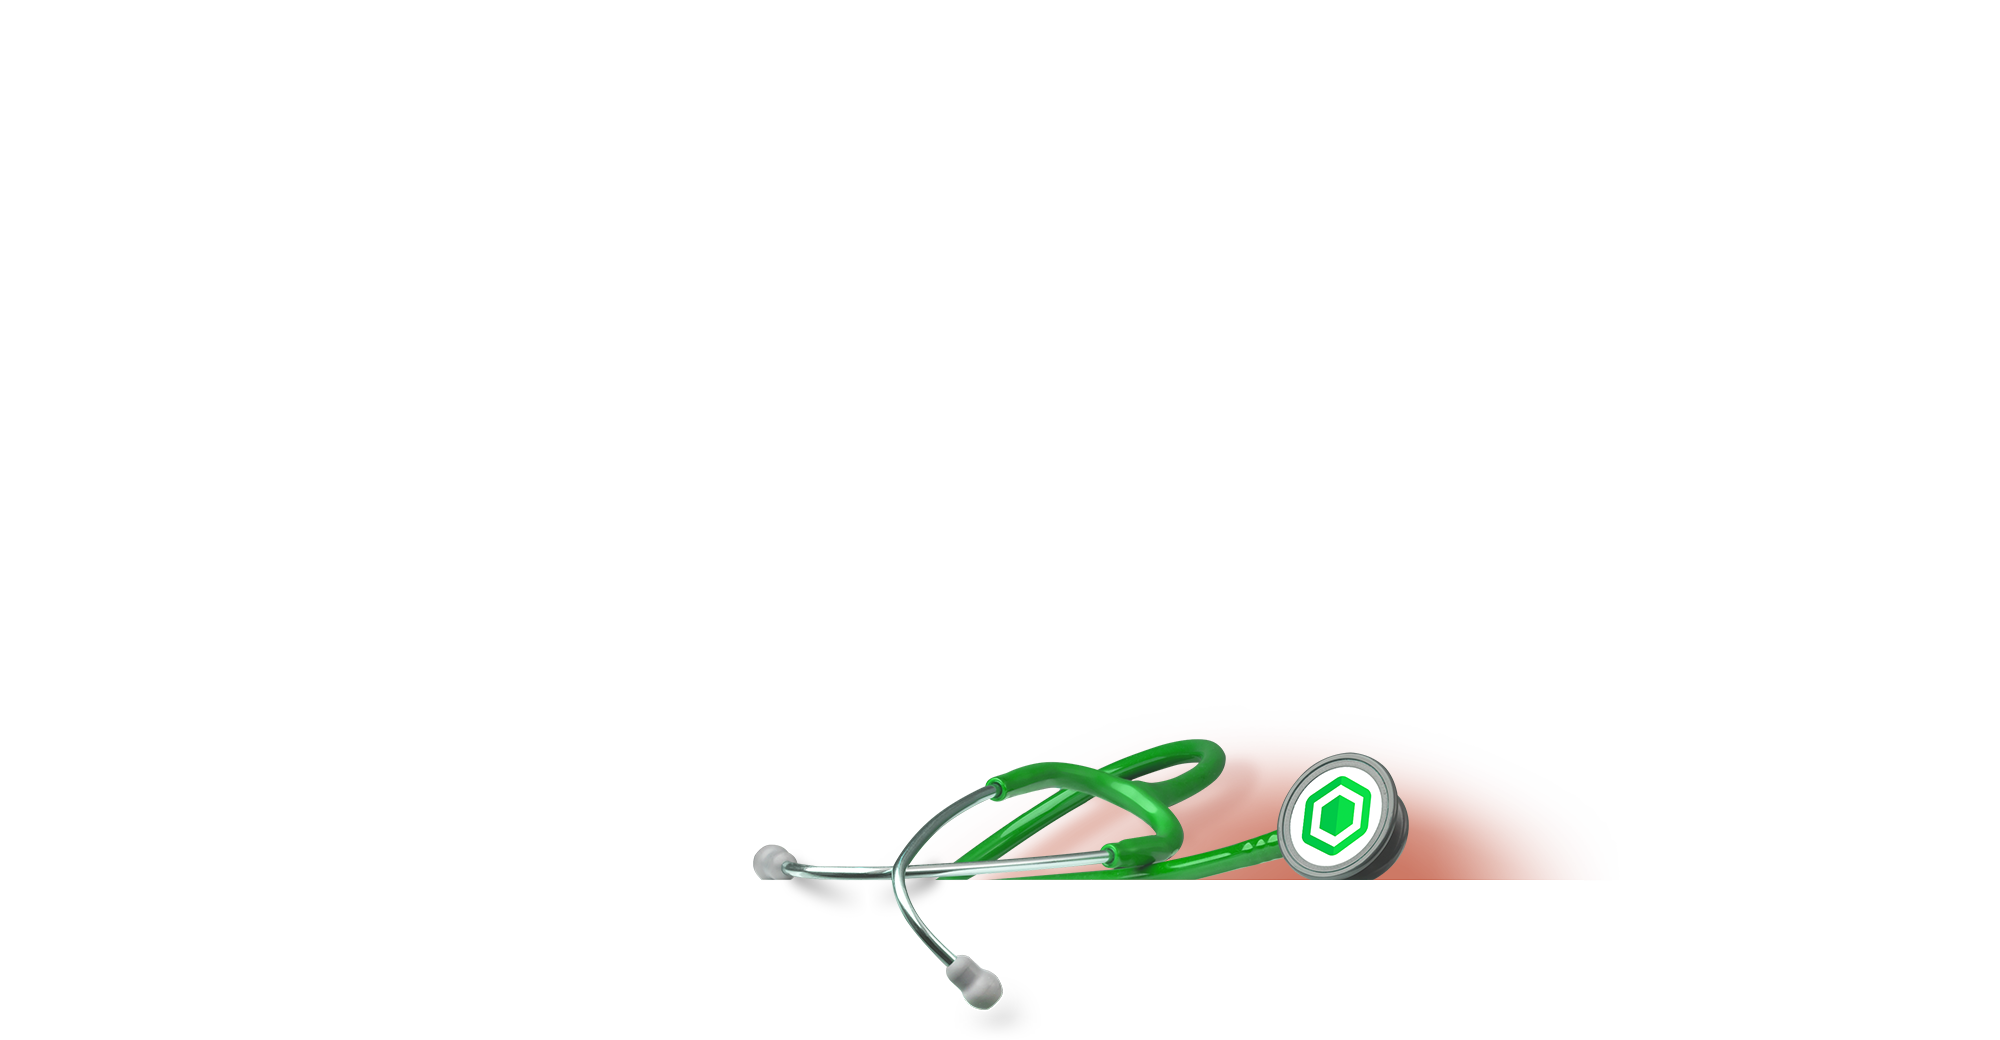 Techealth Stethoscope